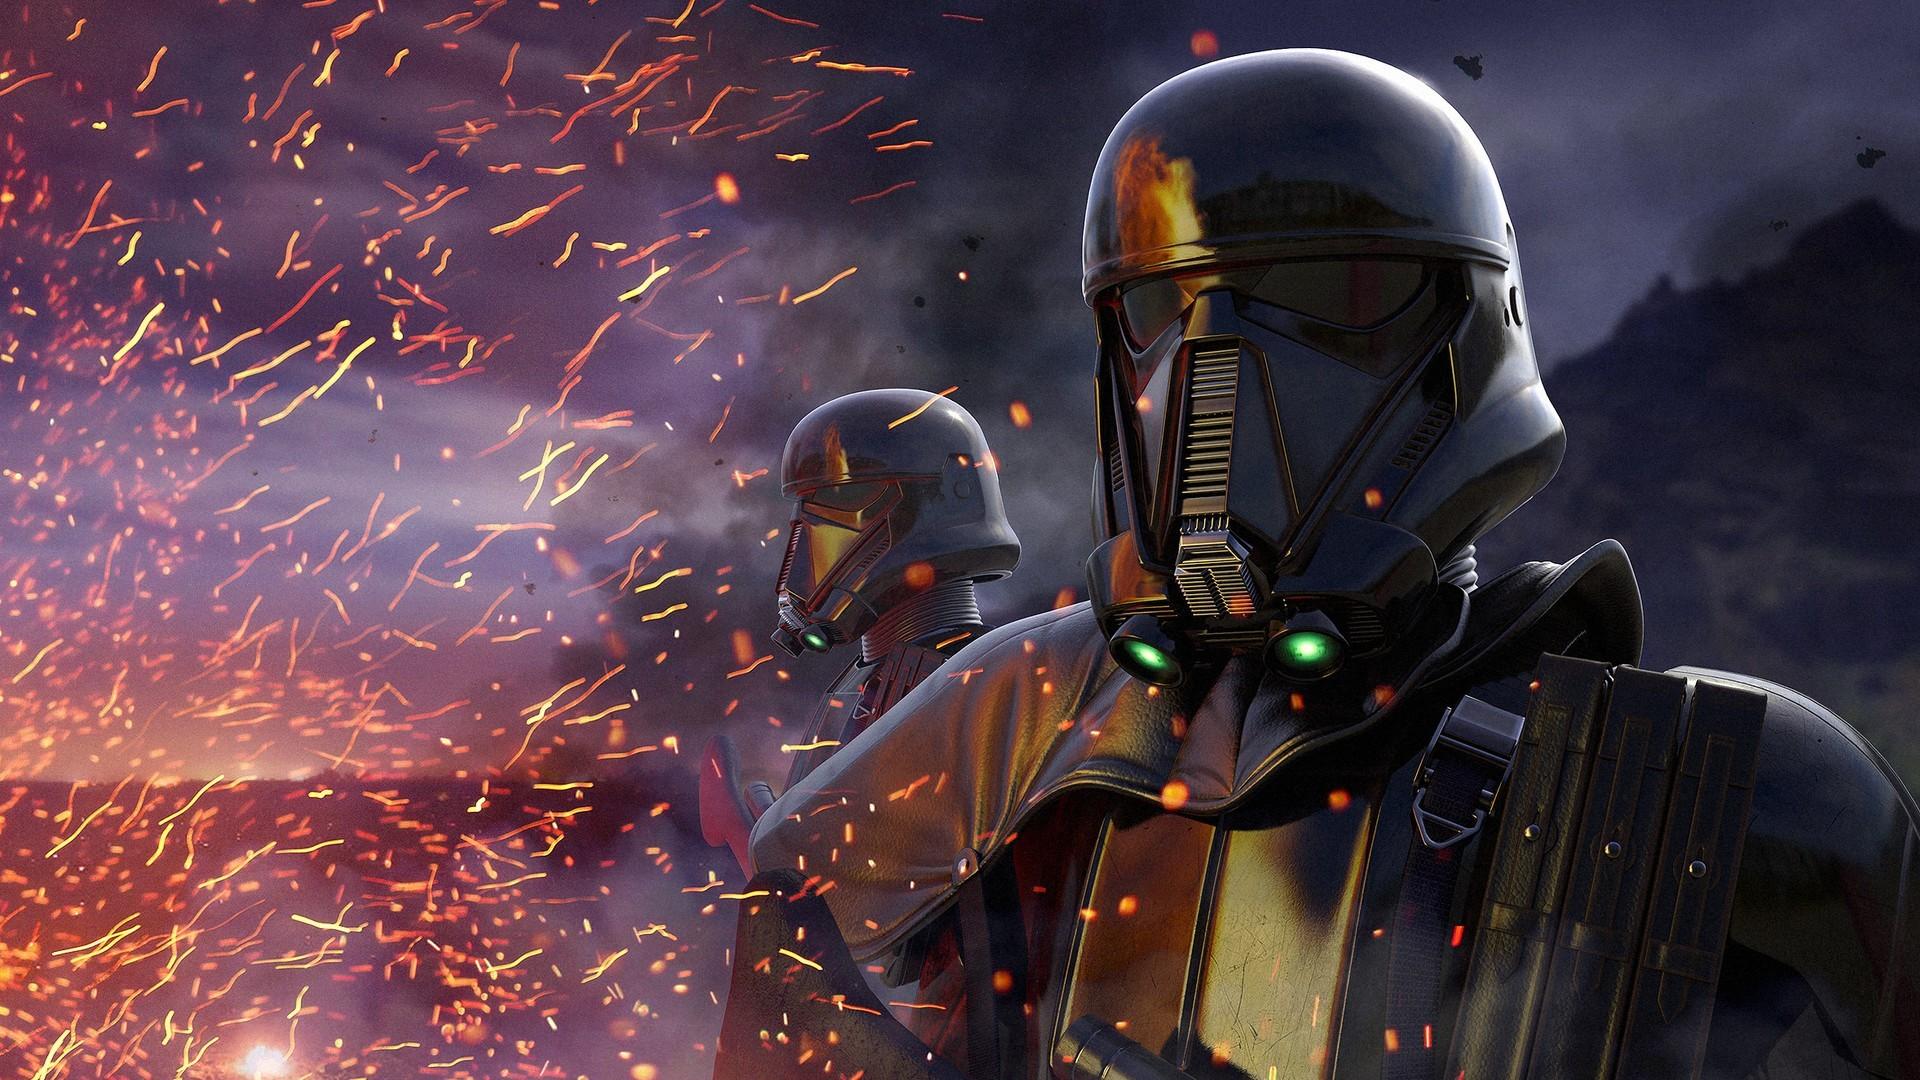 General 1920x1080 Star Wars Storm Troopers Rogue One: A Star Wars Story digital art science fiction helmet